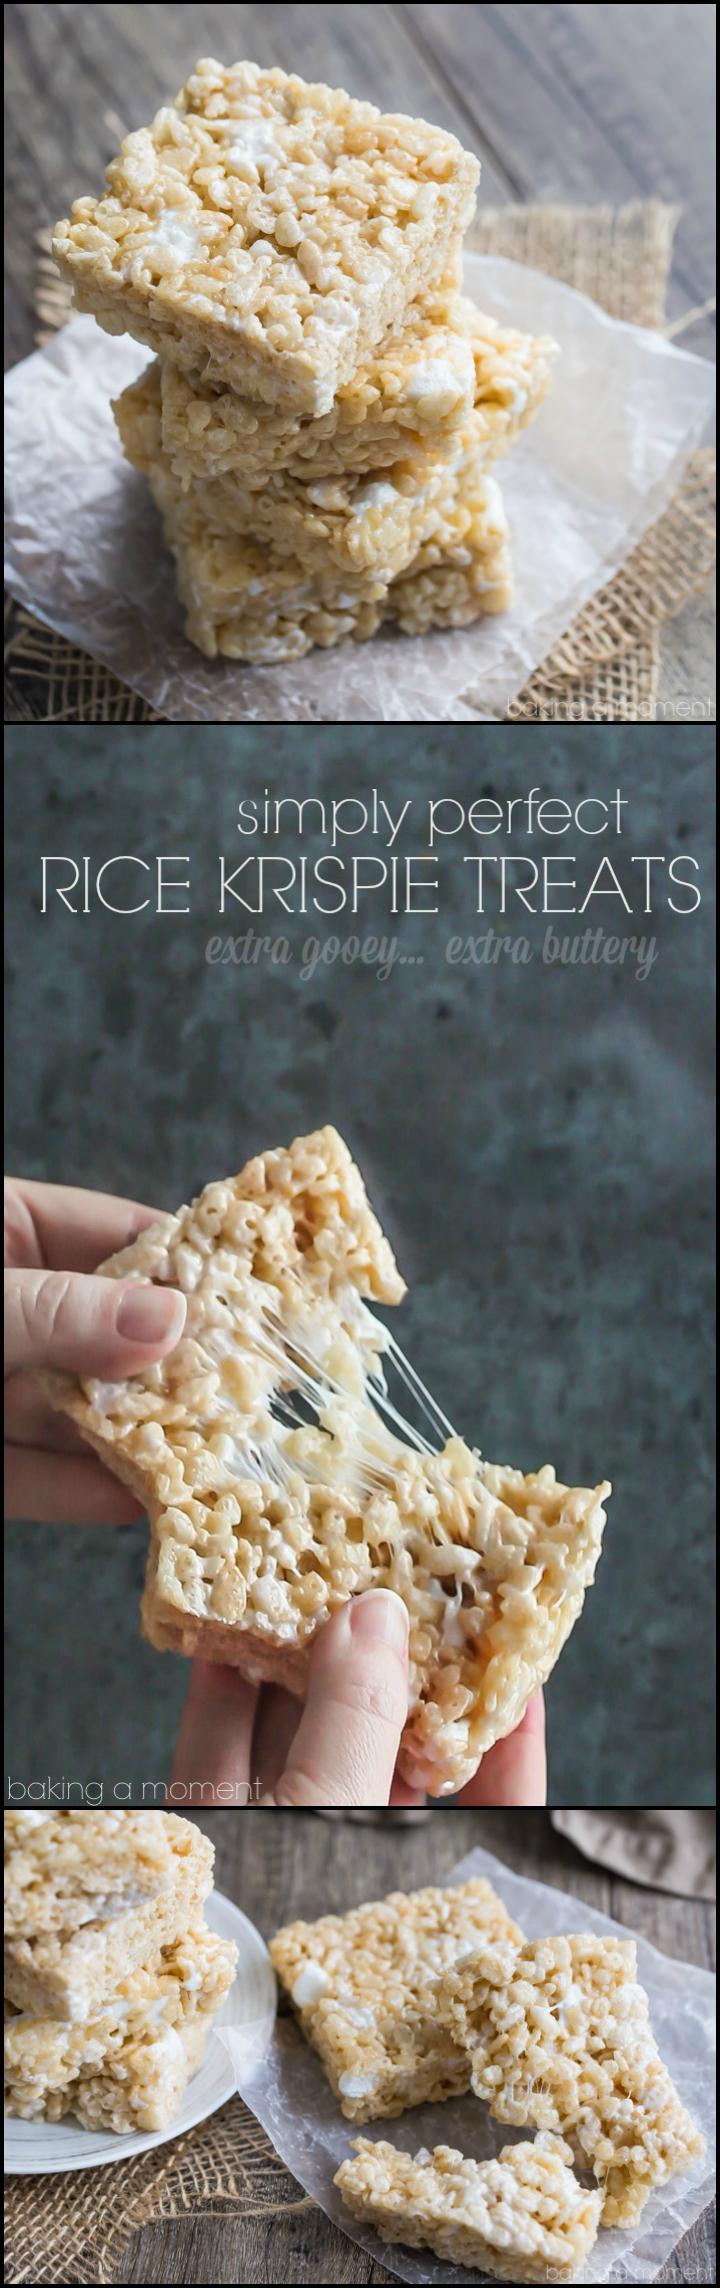 Simply Perfect Rice Krispie Treats